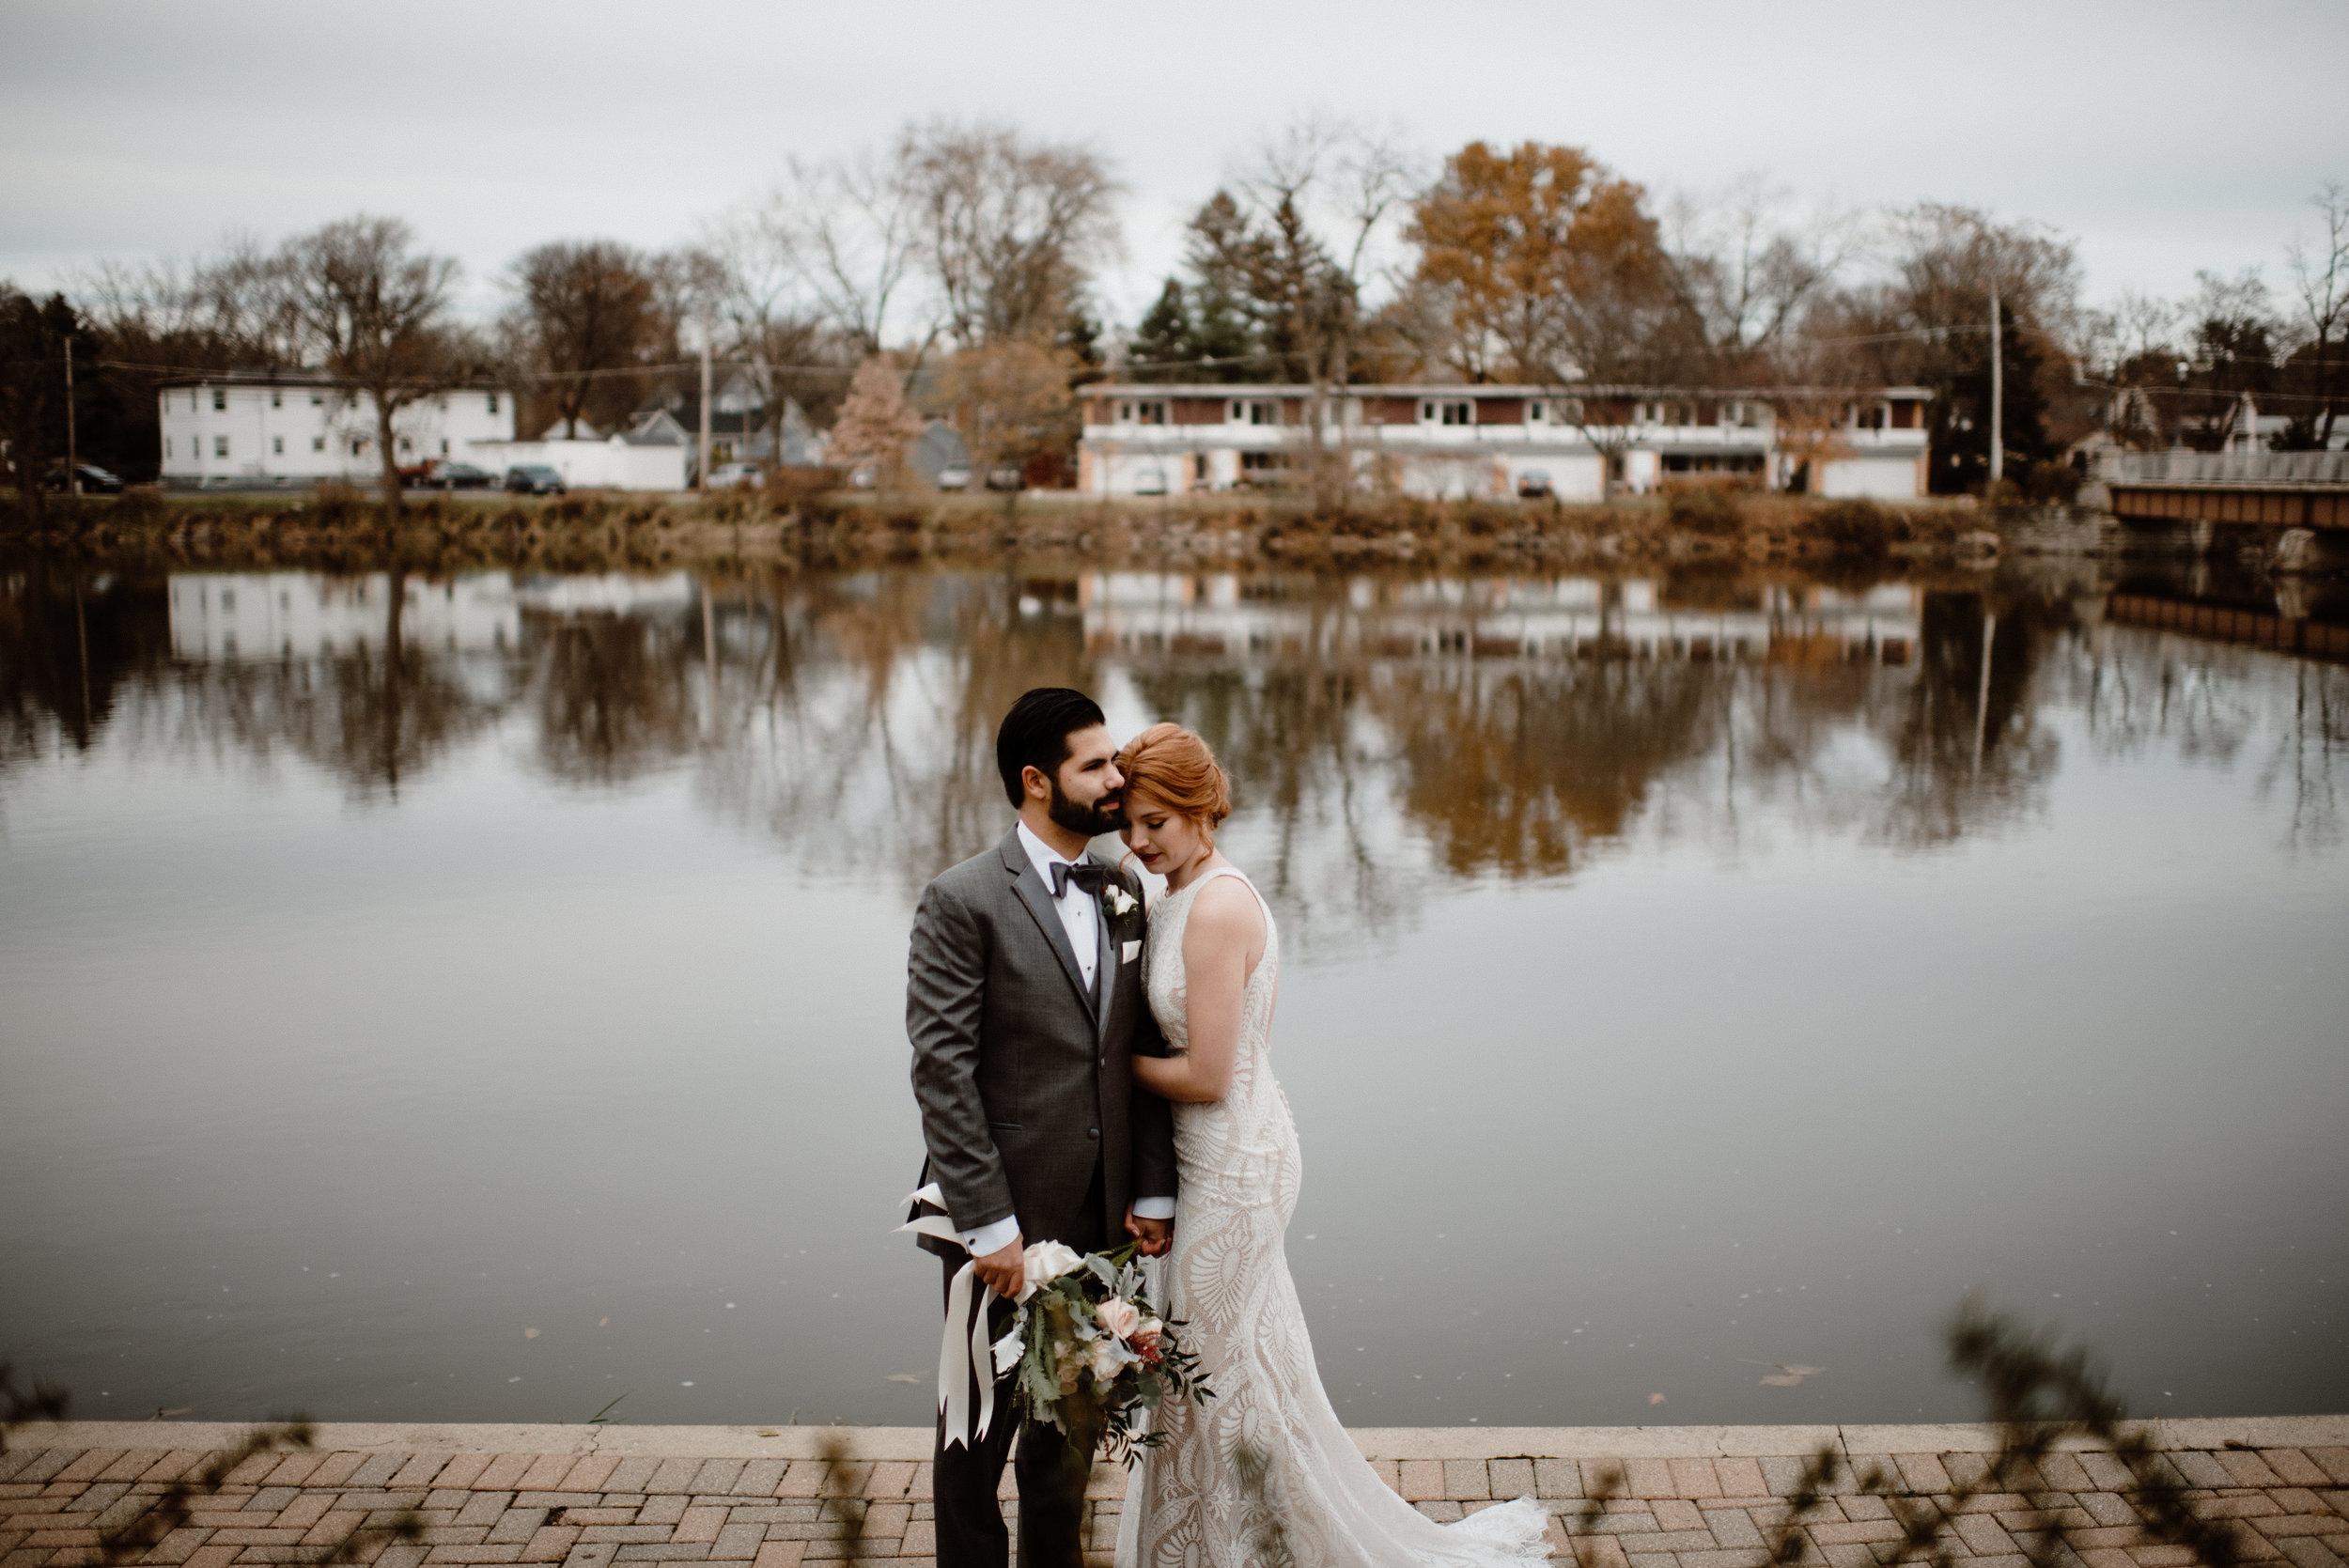 The Brix on Fox, Chicago Wedding Photographer, Zach and Rosalie00038.jpg